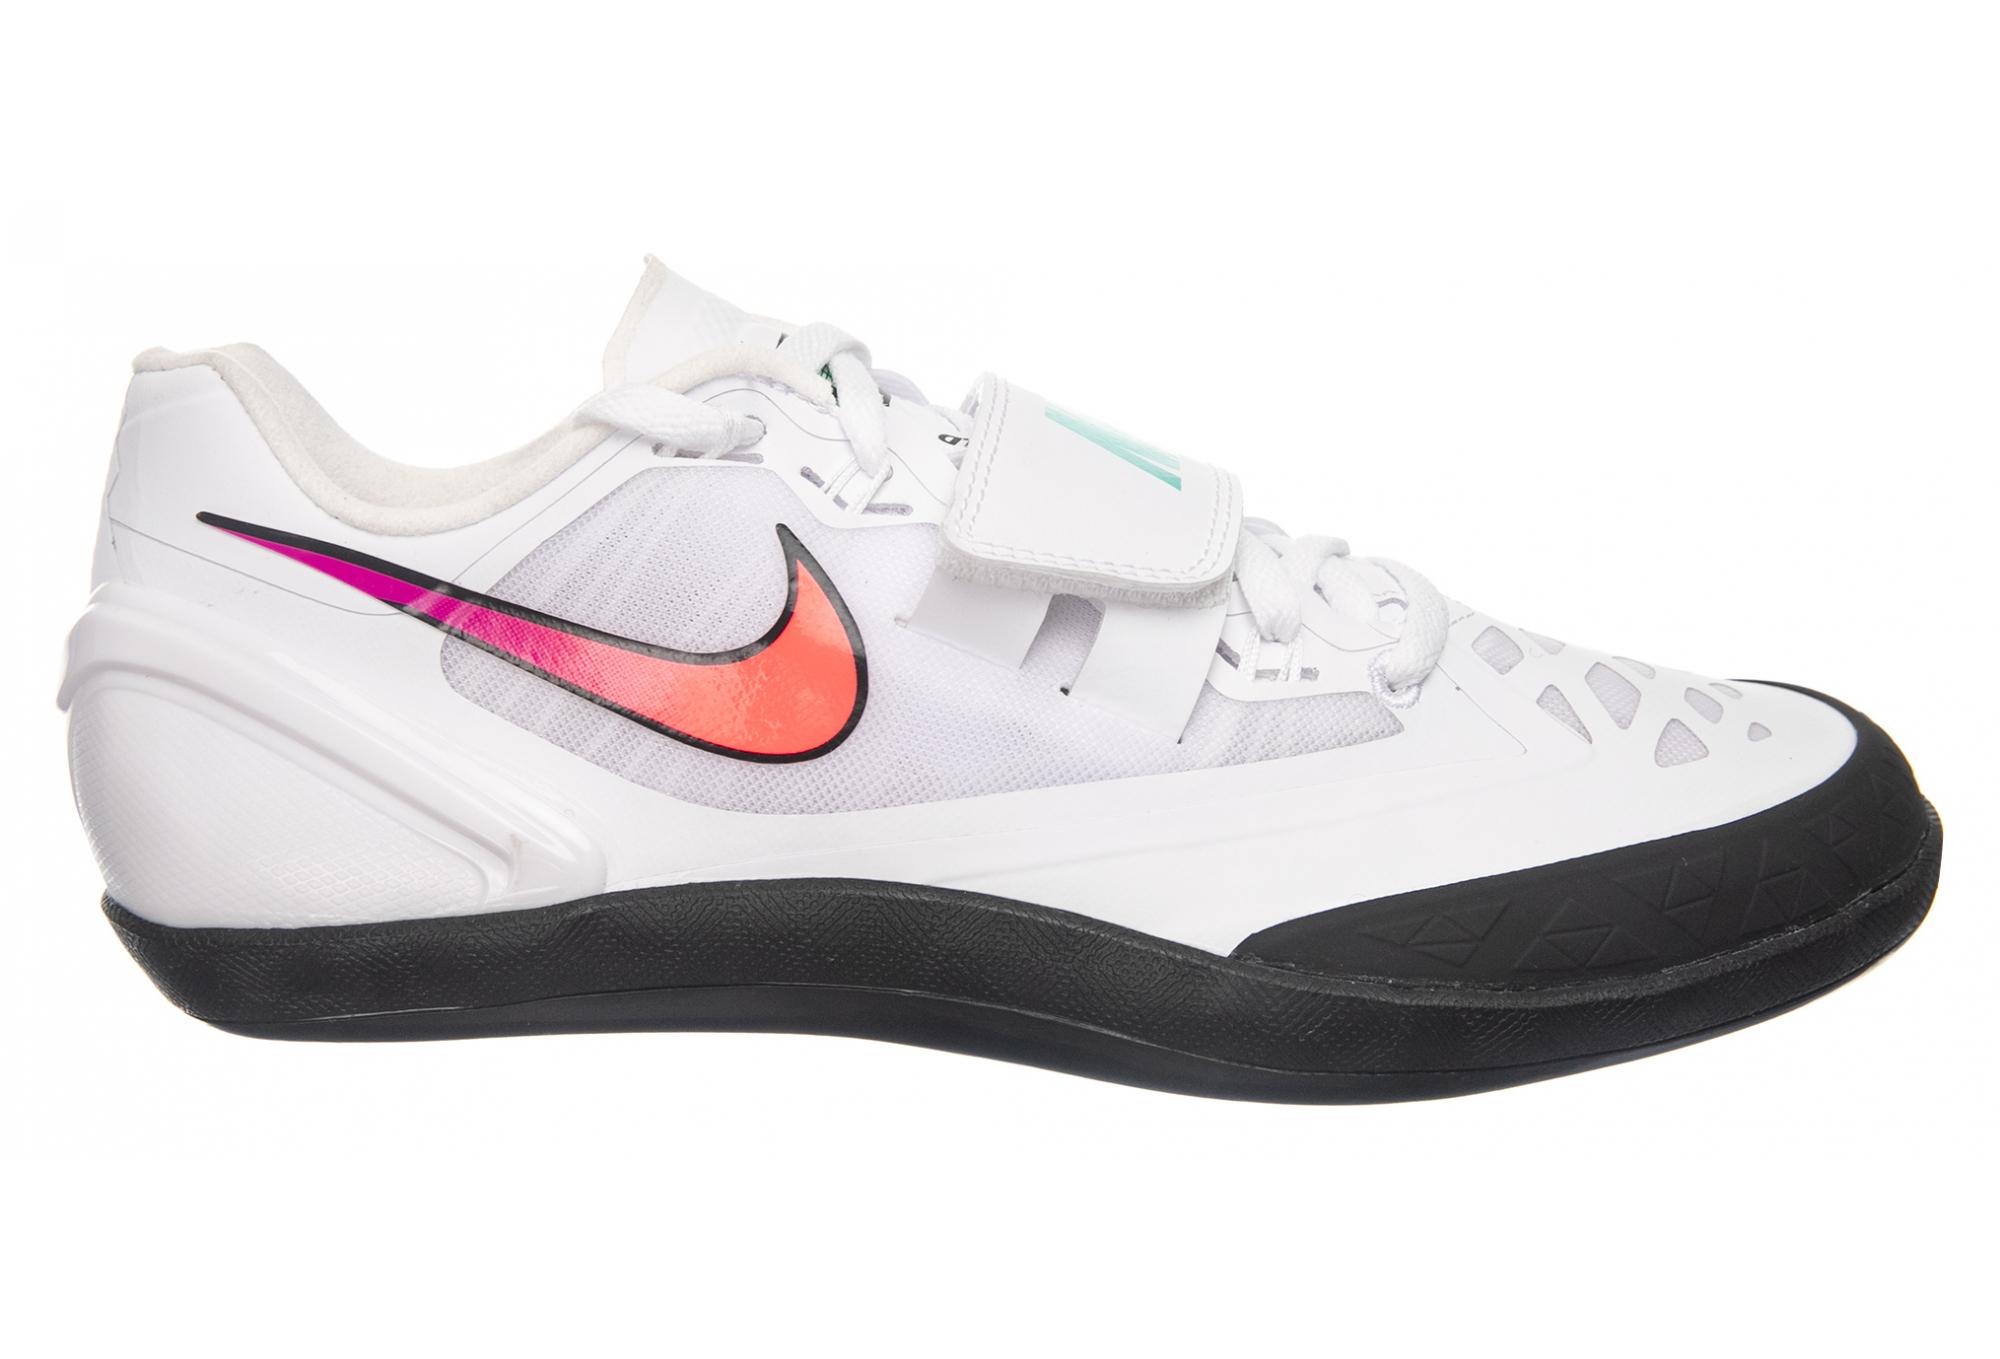 Nike Zoom Rotational 6 White Multi-color Unisex Shoes   Alltricks.com